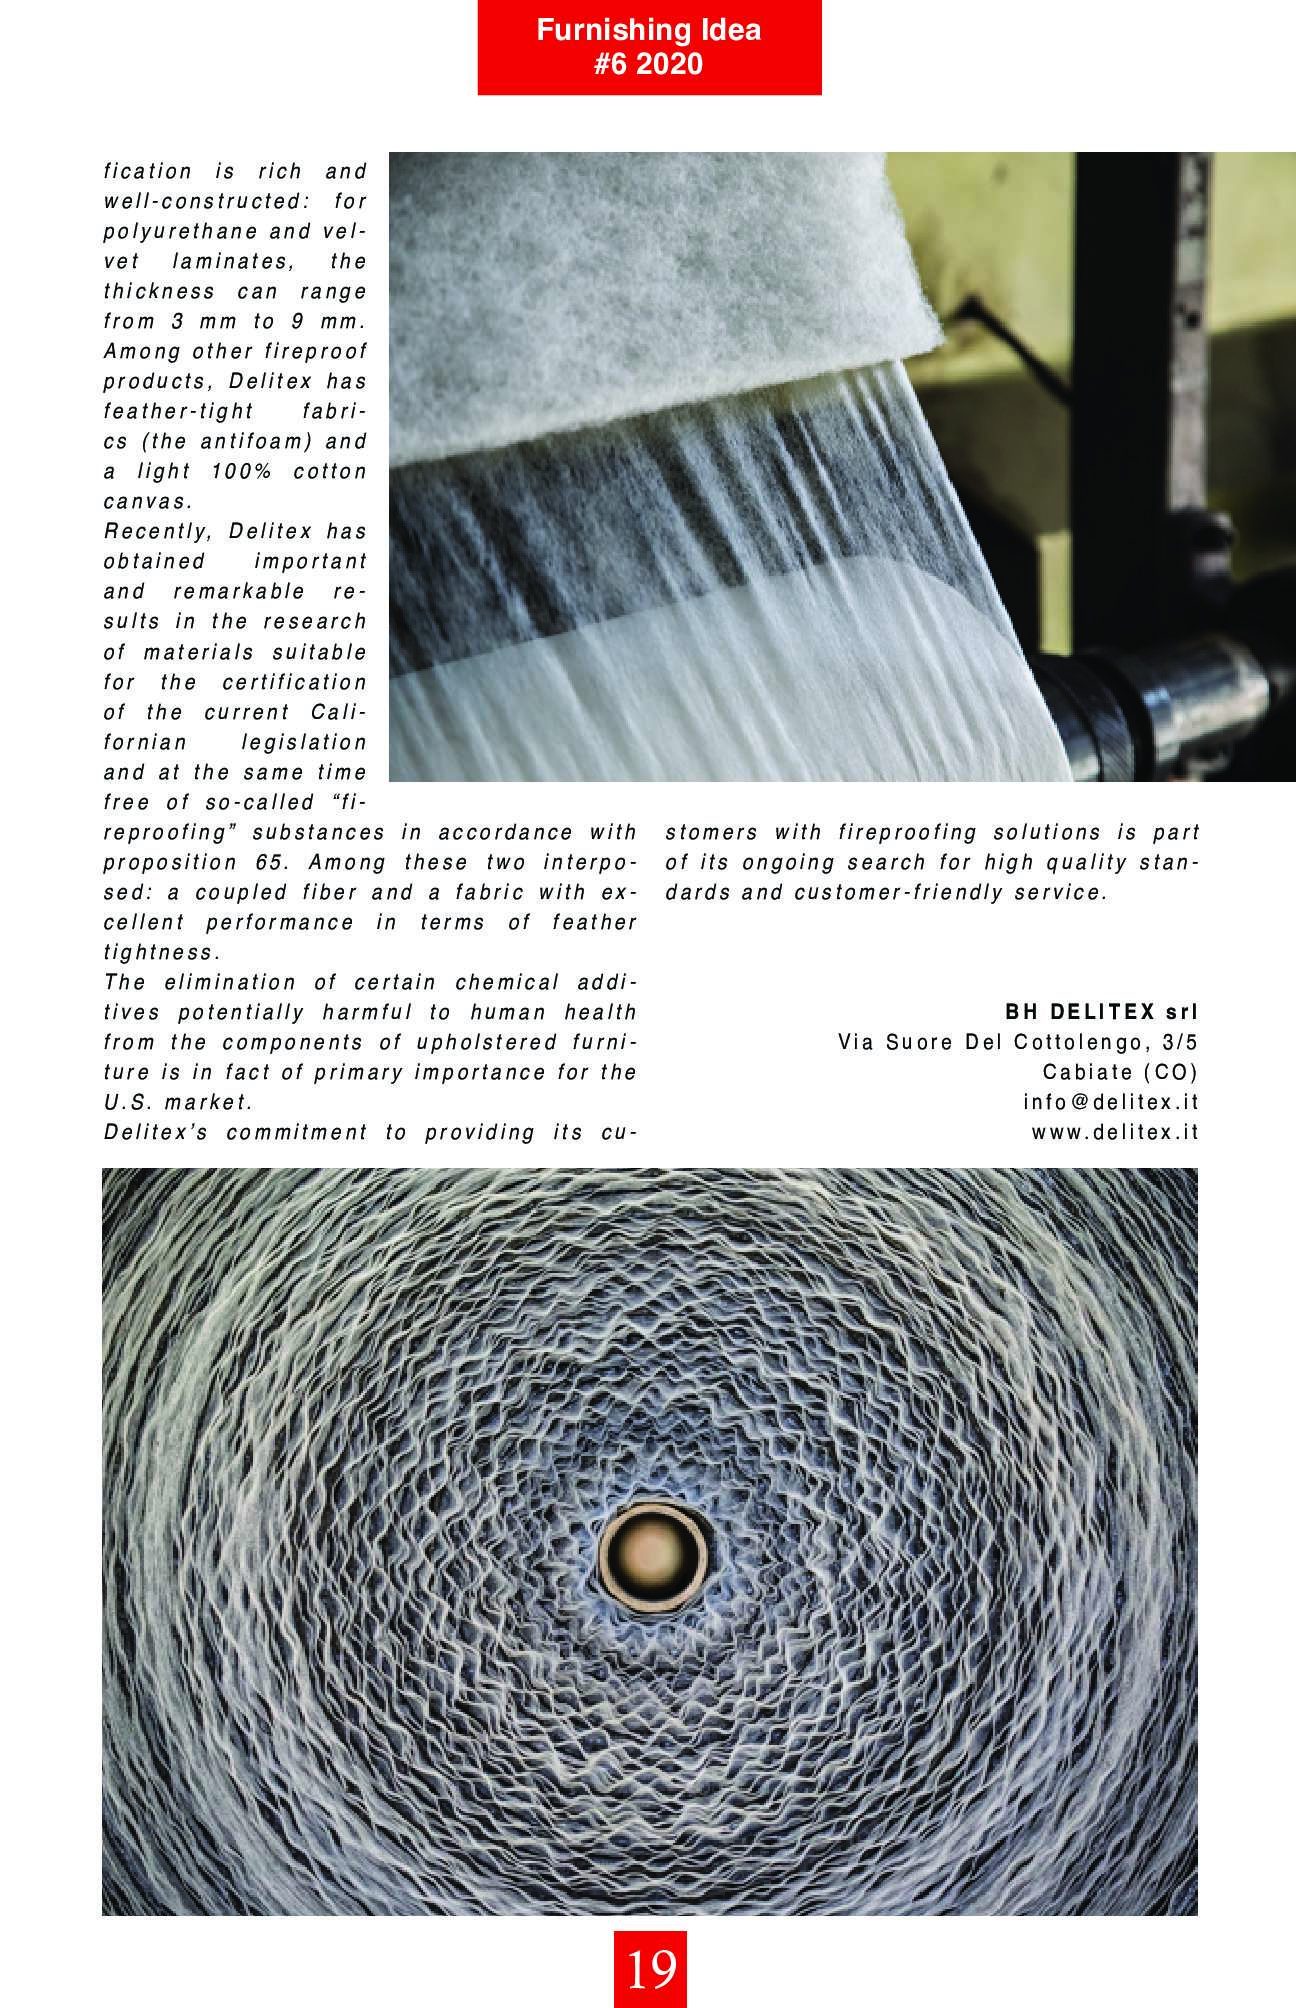 furnishingidea-6-2020_journal_22_018.jpg